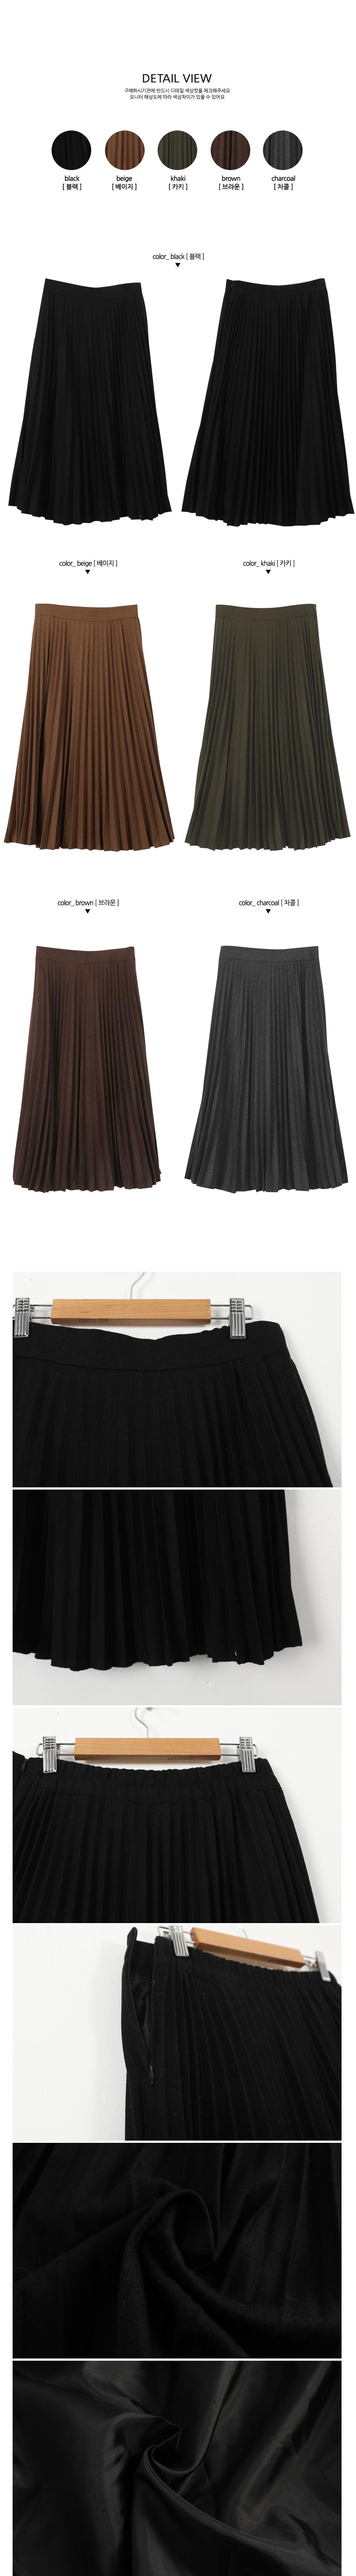 Oz pleats wrinkle long skirt